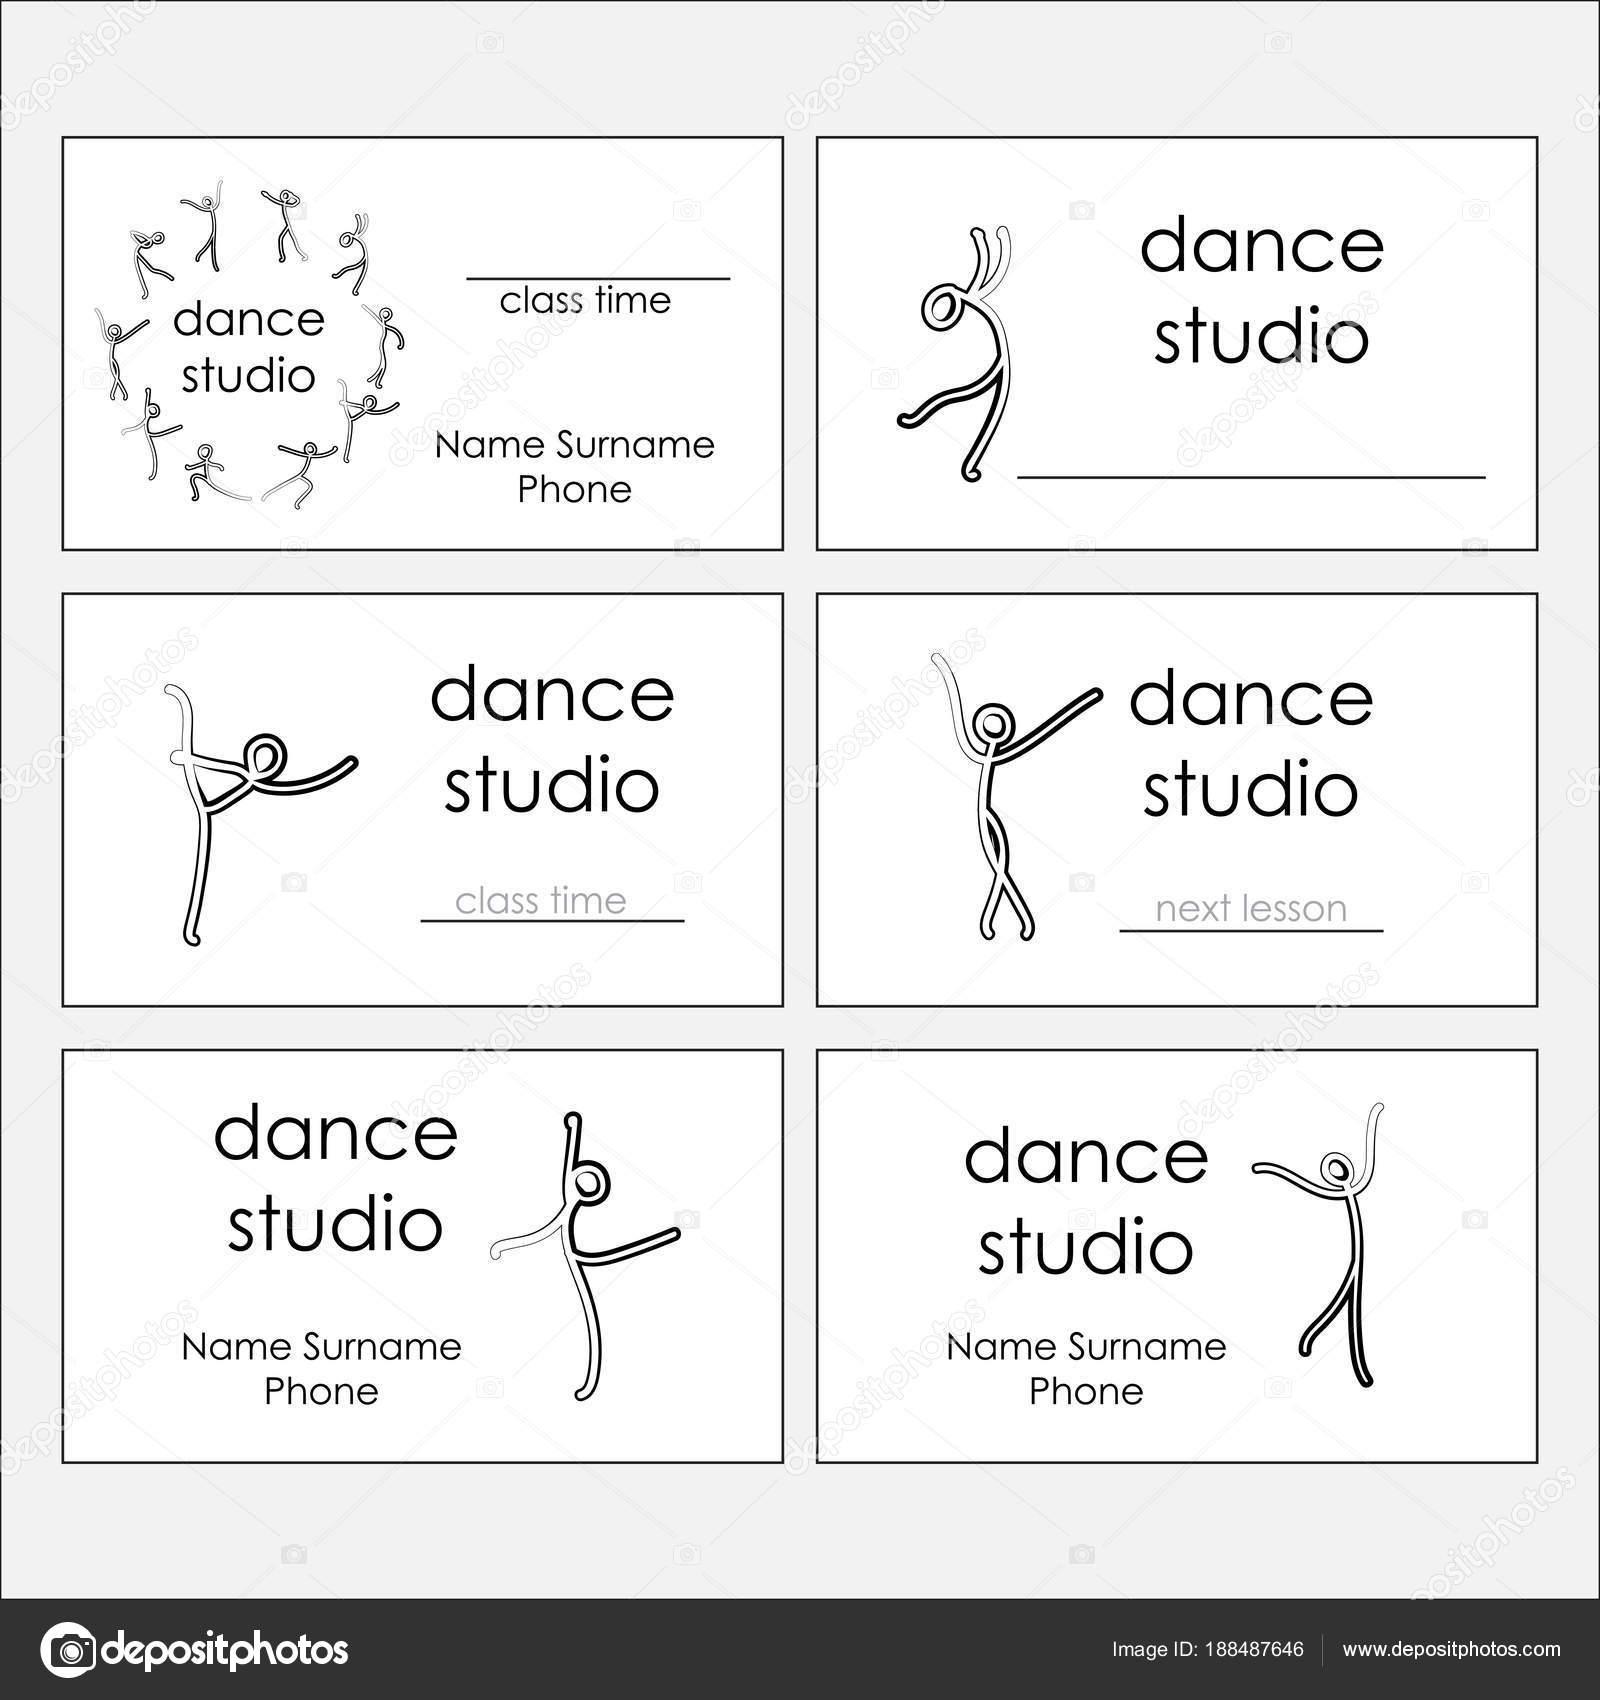 Design of business cards of dance studio, dance class. Vector ...